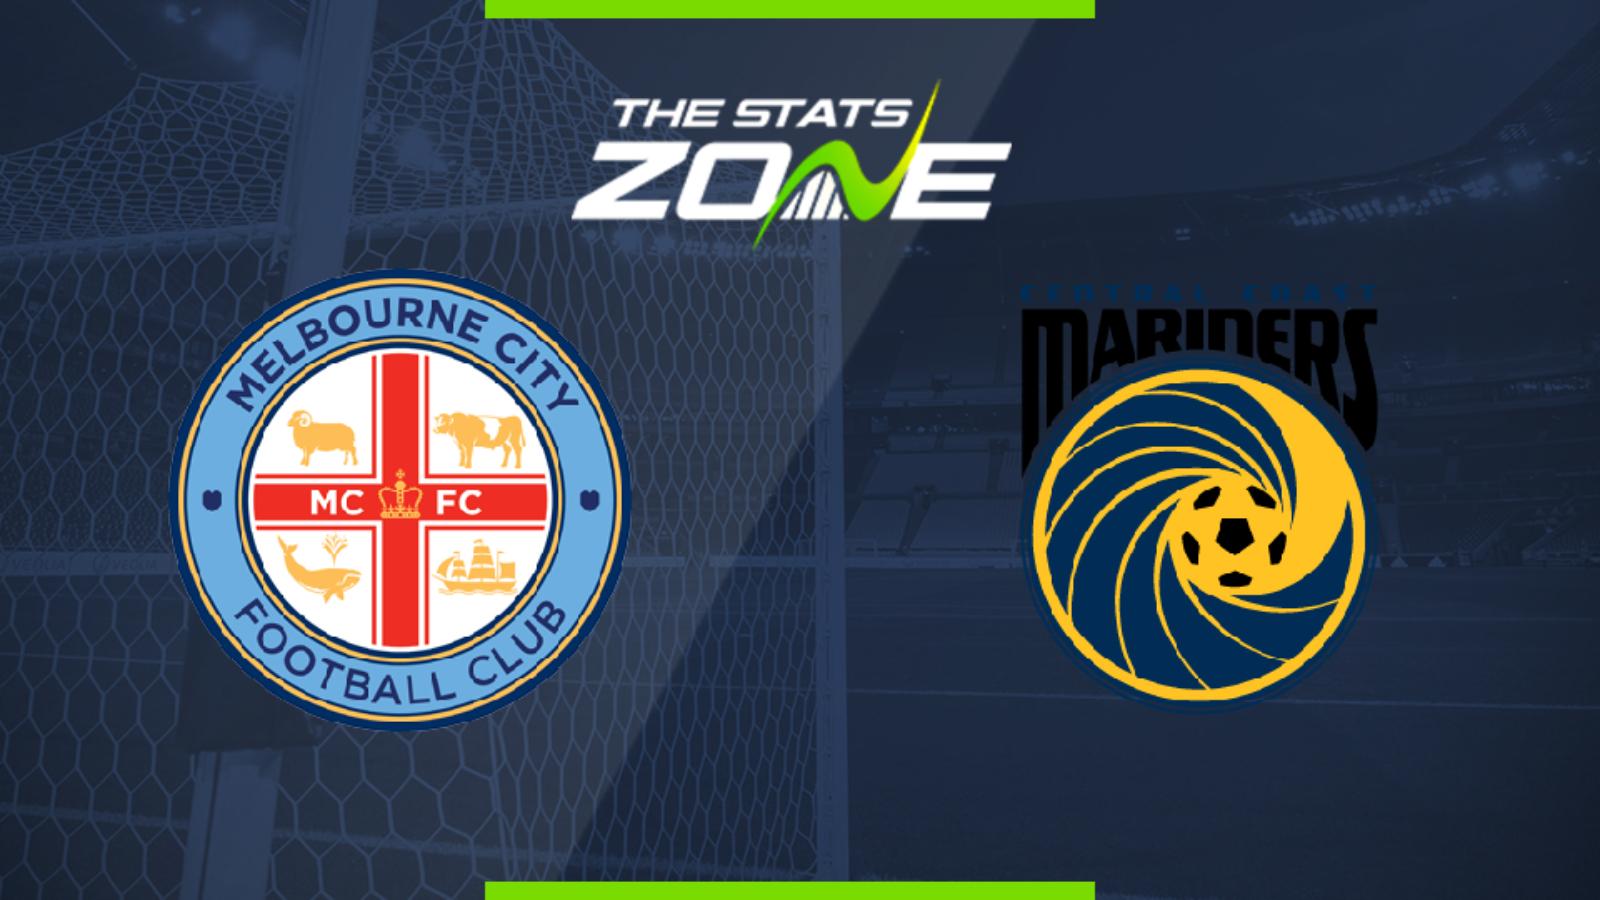 Central coast mariners vs melbourne city bettingexpert football ac milan vs carpi betting preview goal